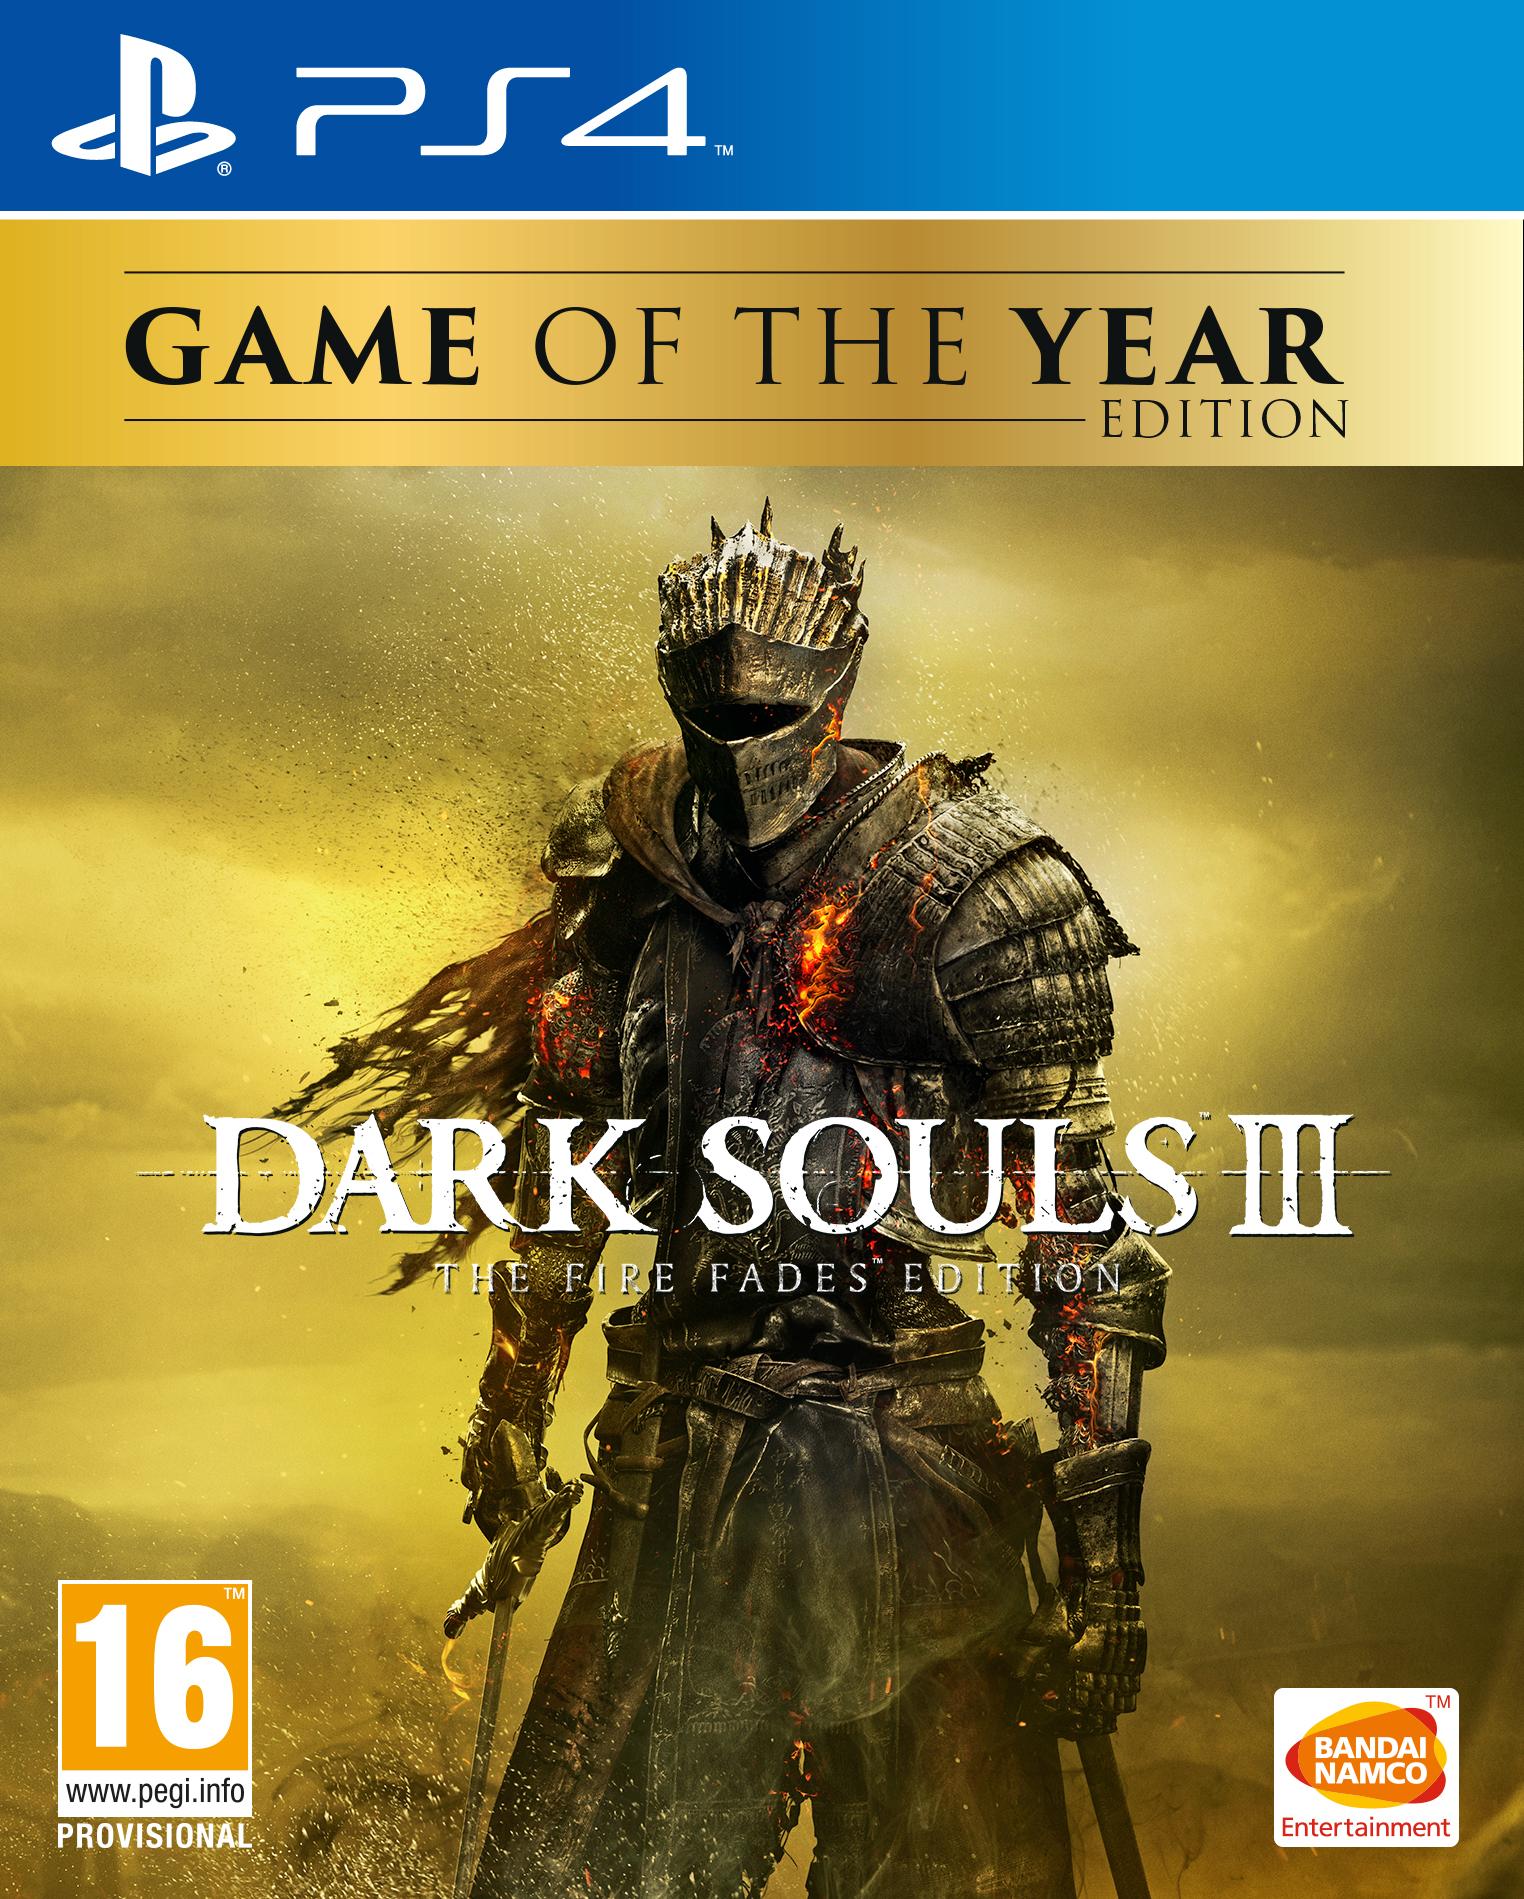 Dark Souls III (3): The Fire Fades